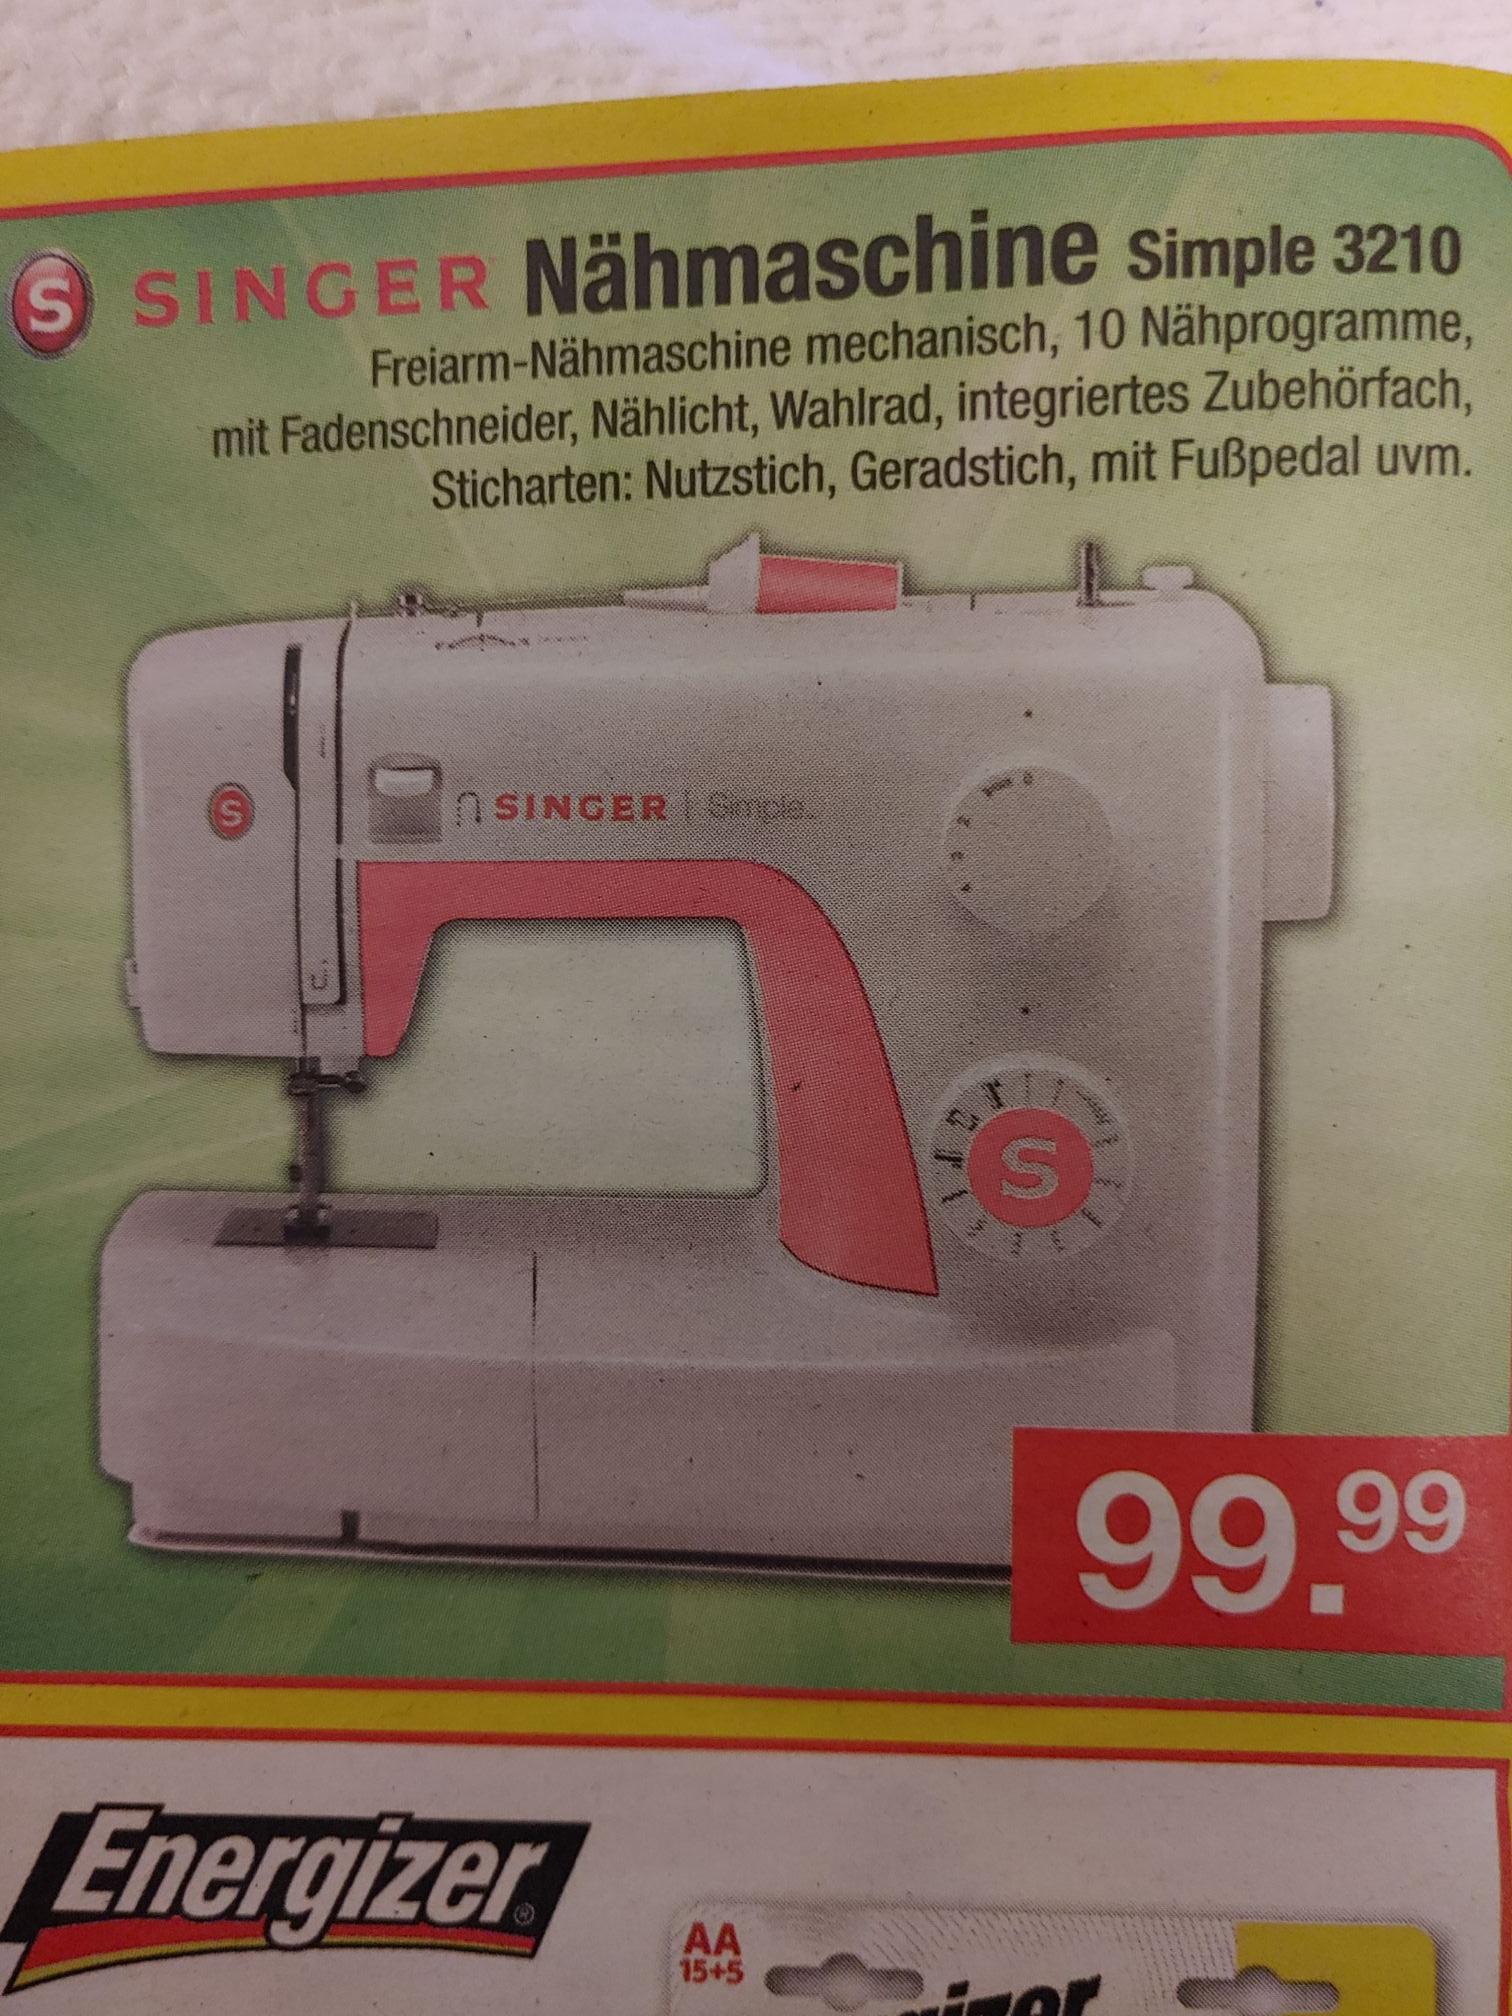 [Zimmermann] Nähmaschine Singer Simple 3210